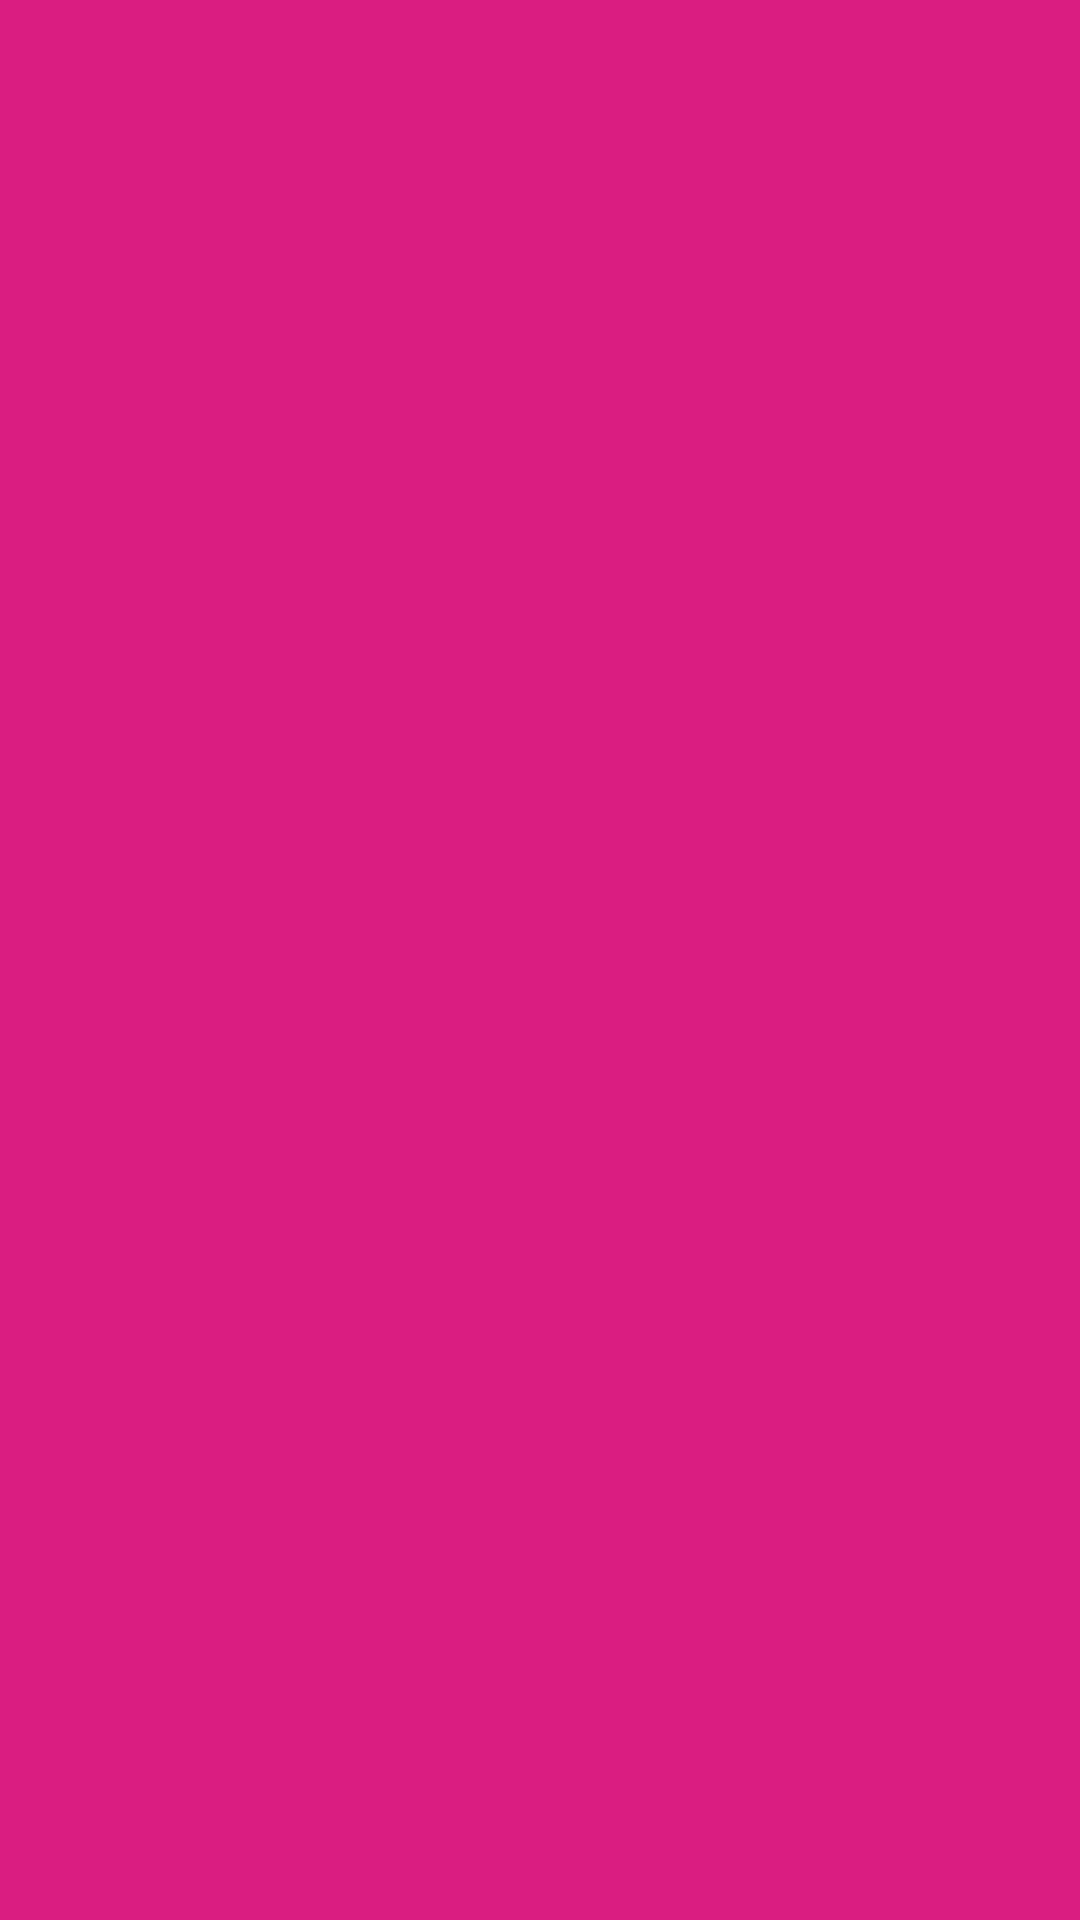 1080x1920 Vivid Cerise Solid Color Background